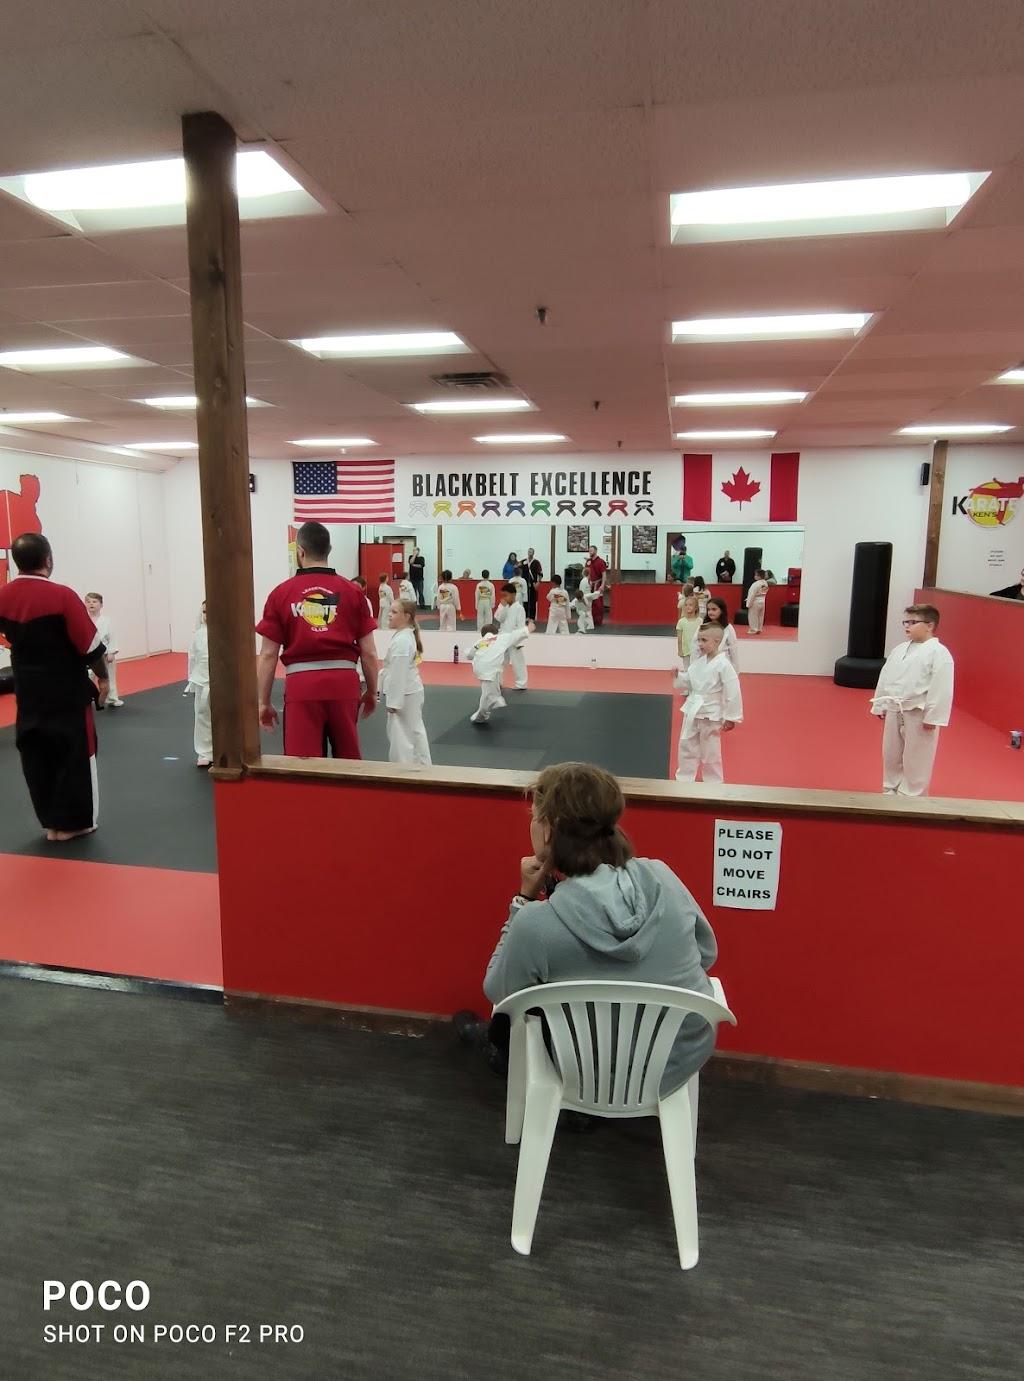 Karate Kens - health  | Photo 5 of 6 | Address: 5901 S Transit Rd, Lockport, NY 14094, USA | Phone: (716) 439-1198